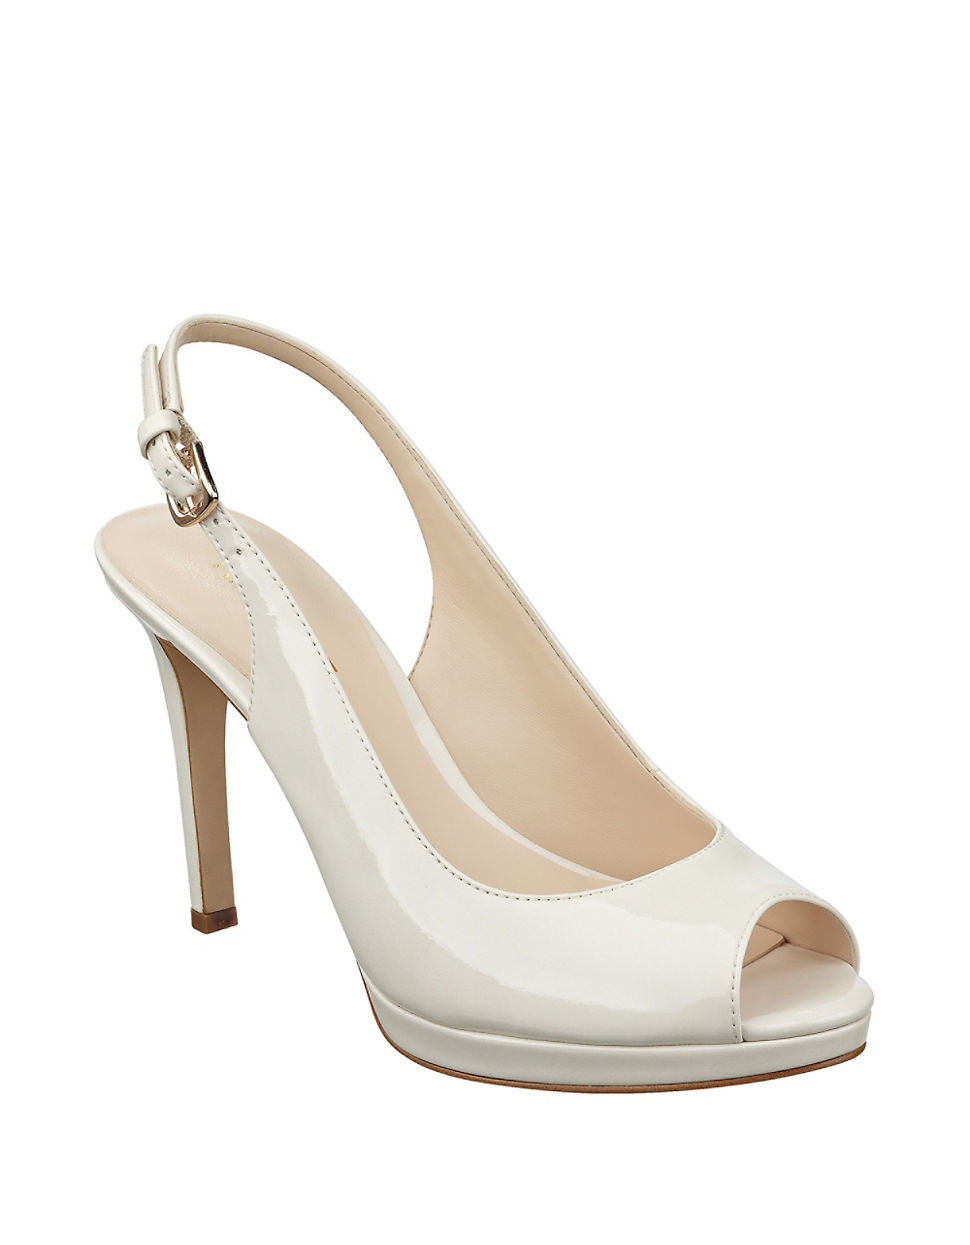 4a1591a1c954 Lyst - Nine West Emilyna Slingback Sandals